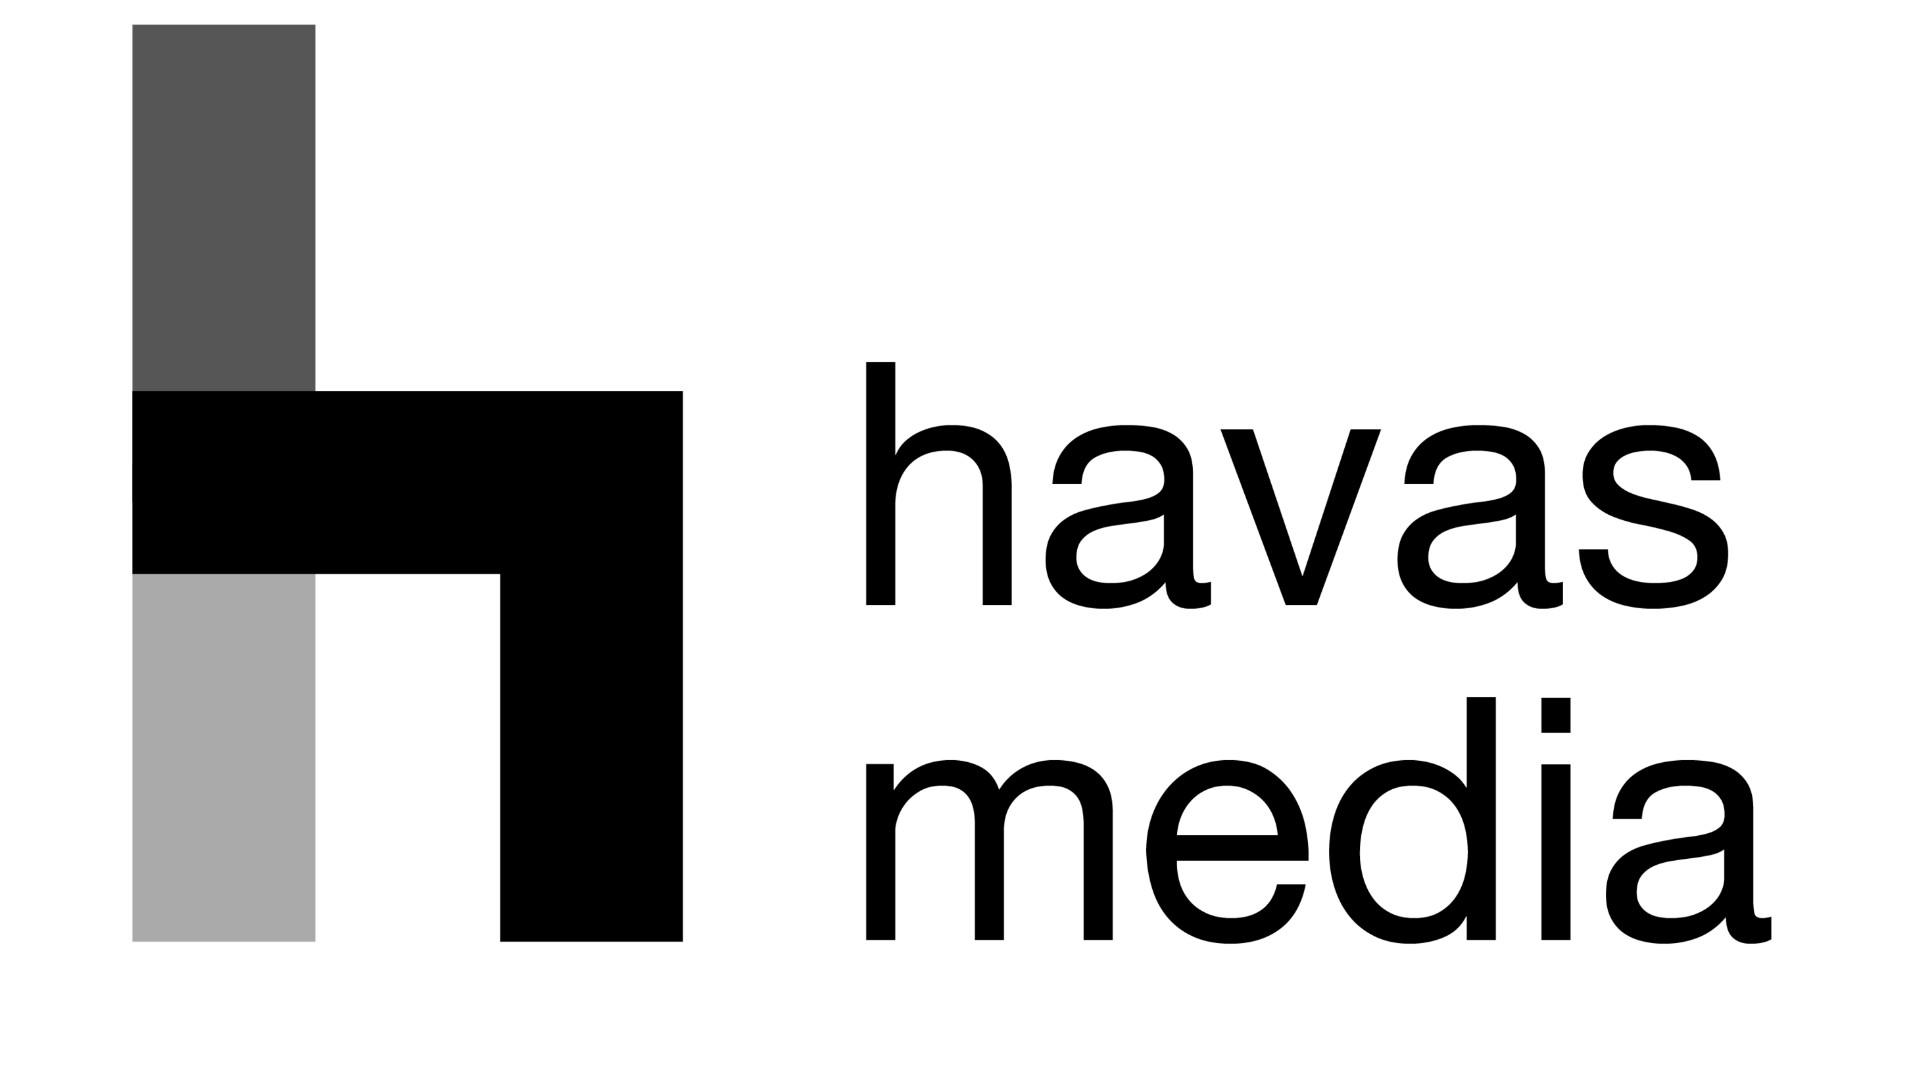 Havas Média (1) logo